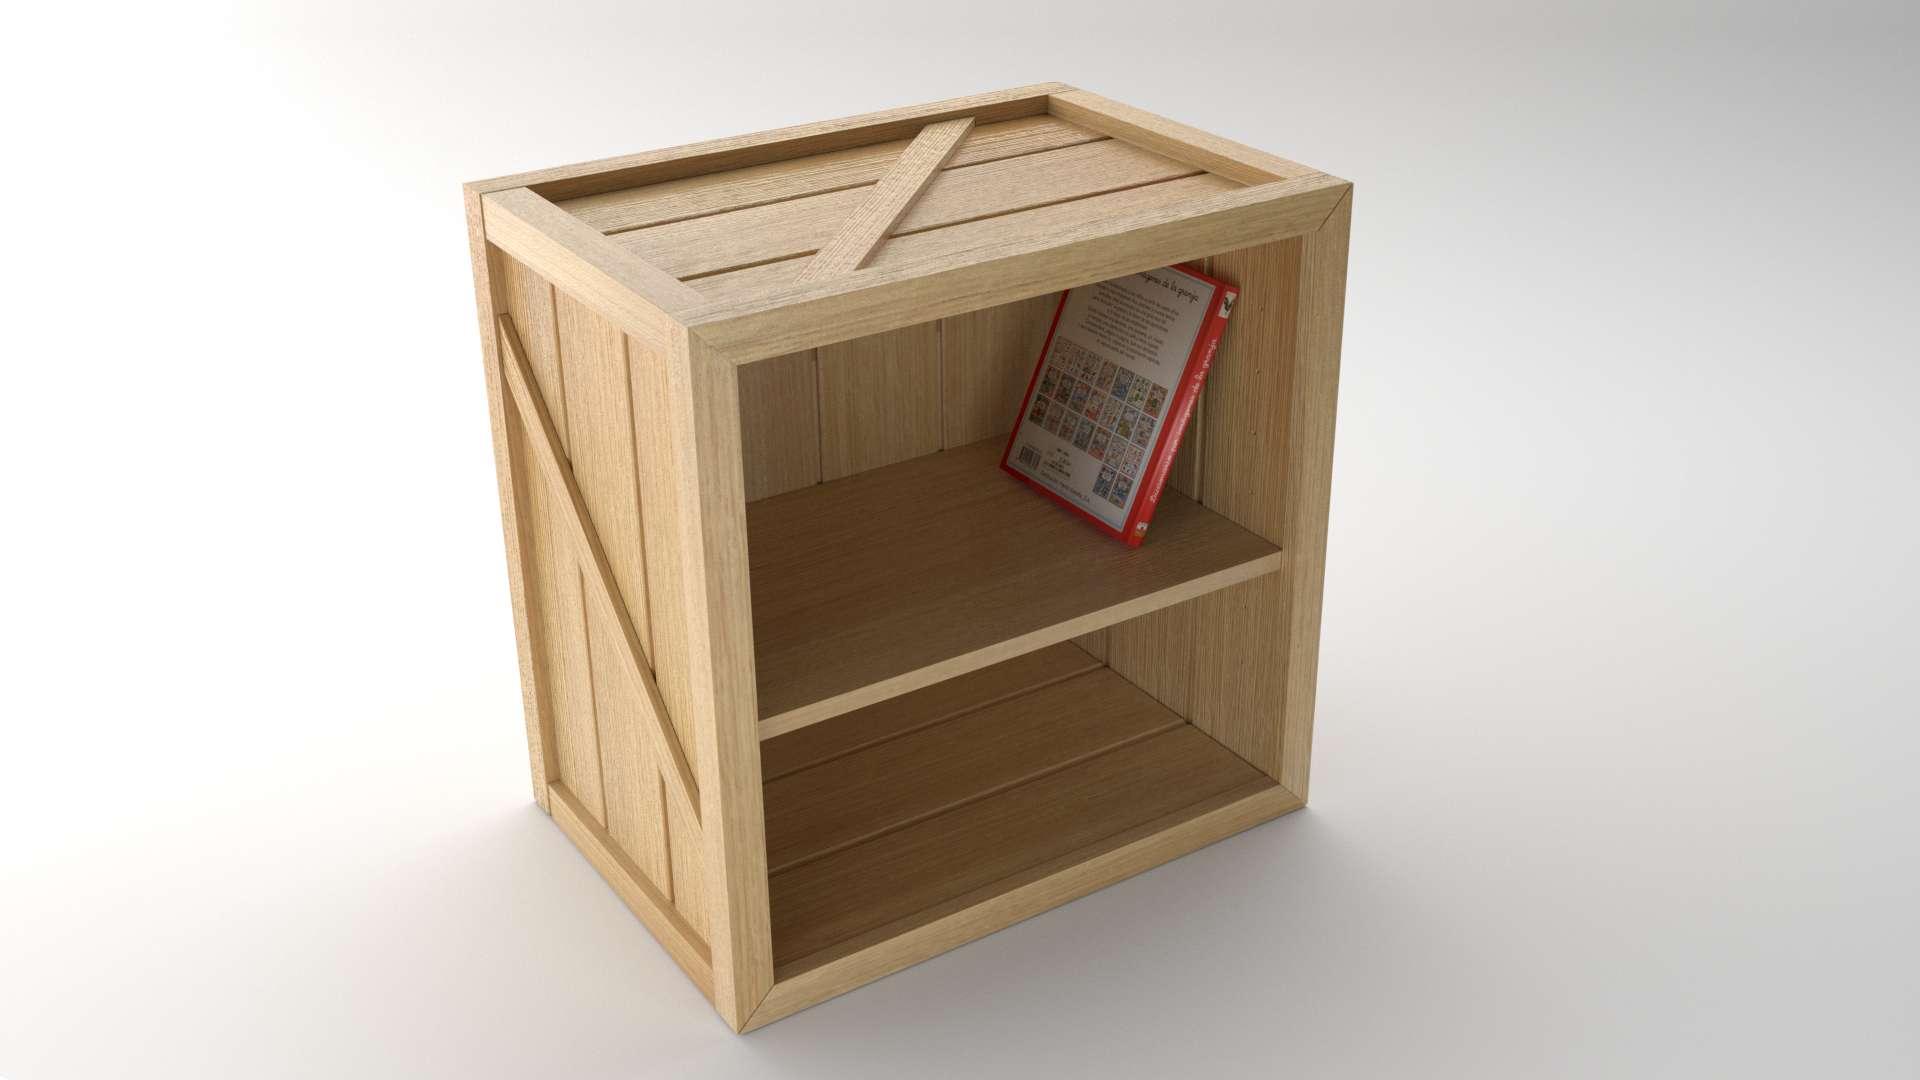 Model Crusoe CabinetShelf Vista 2